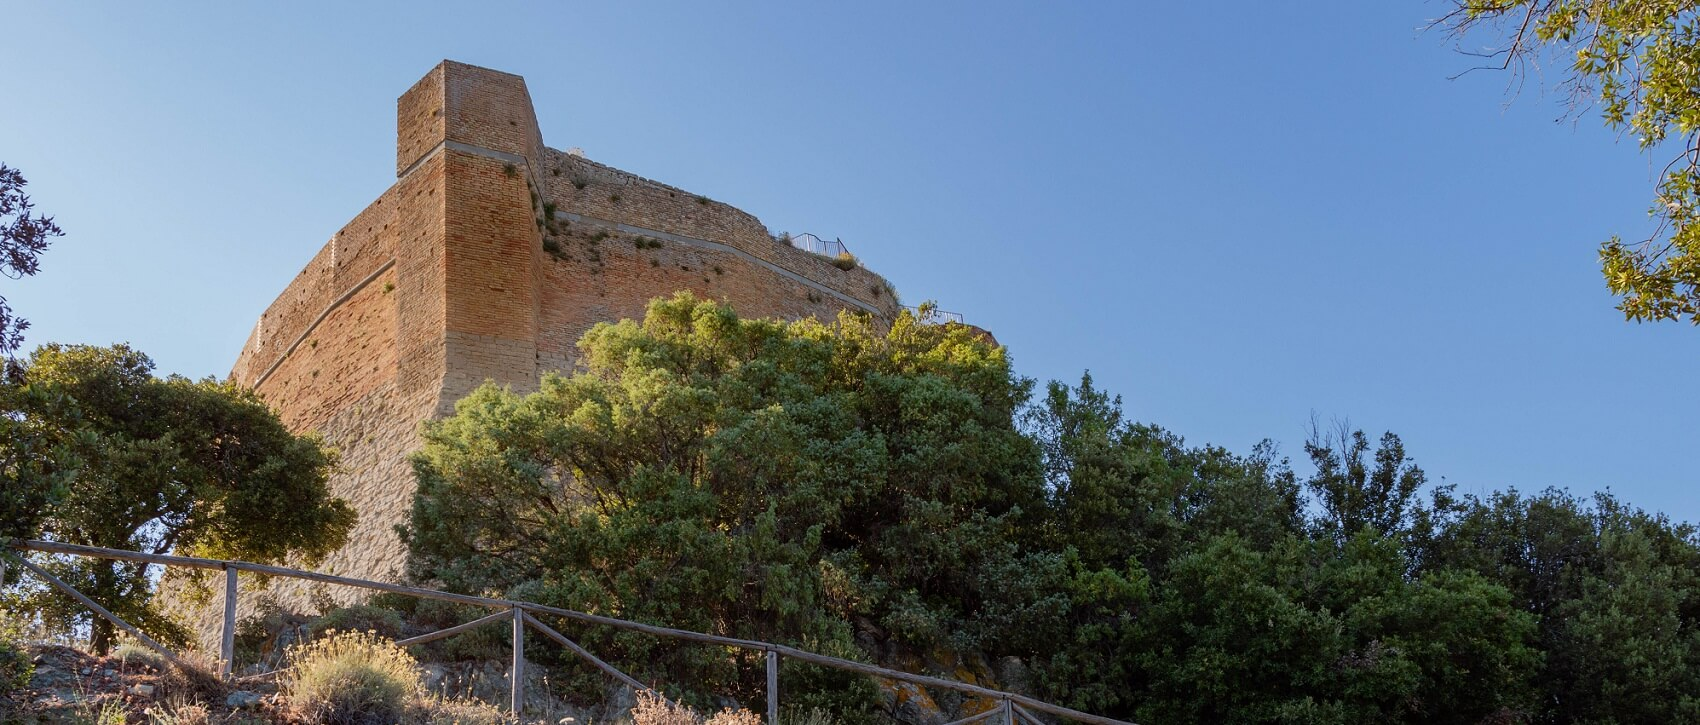 Rocca Sillana di Pomarance